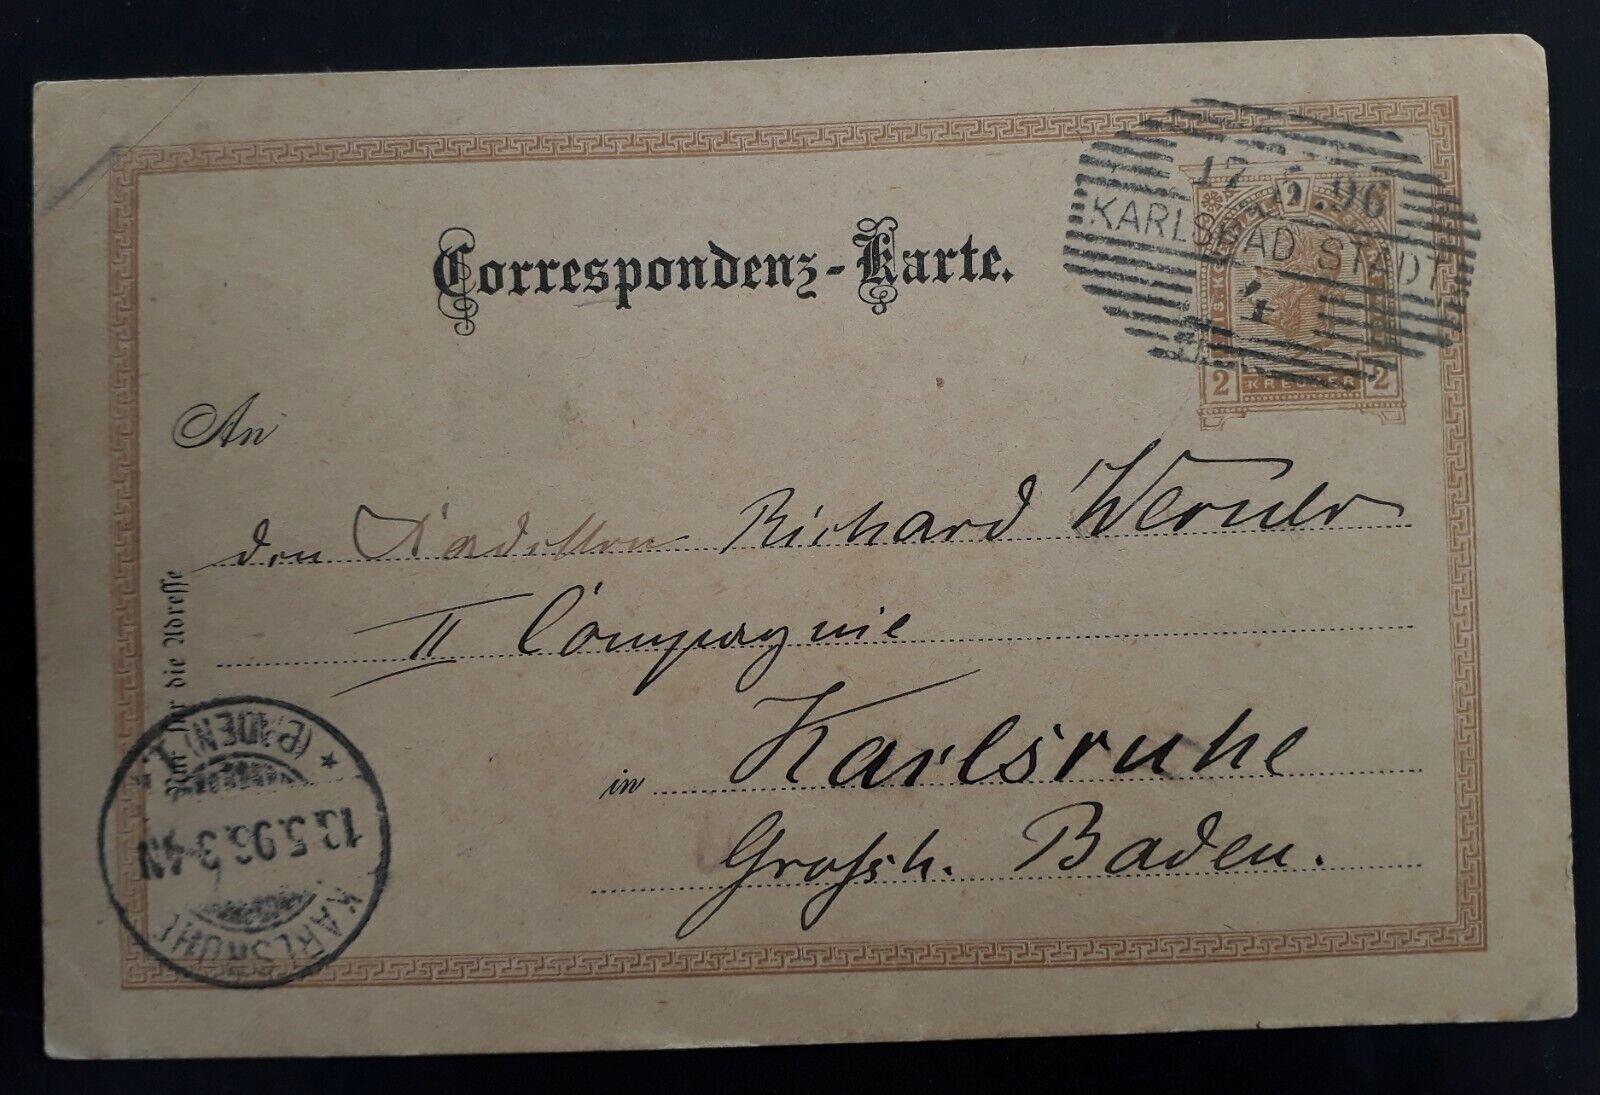 1896 Austria 2Kr brown Stamped Postcard cancelled Karlsbad to Karlsruhe